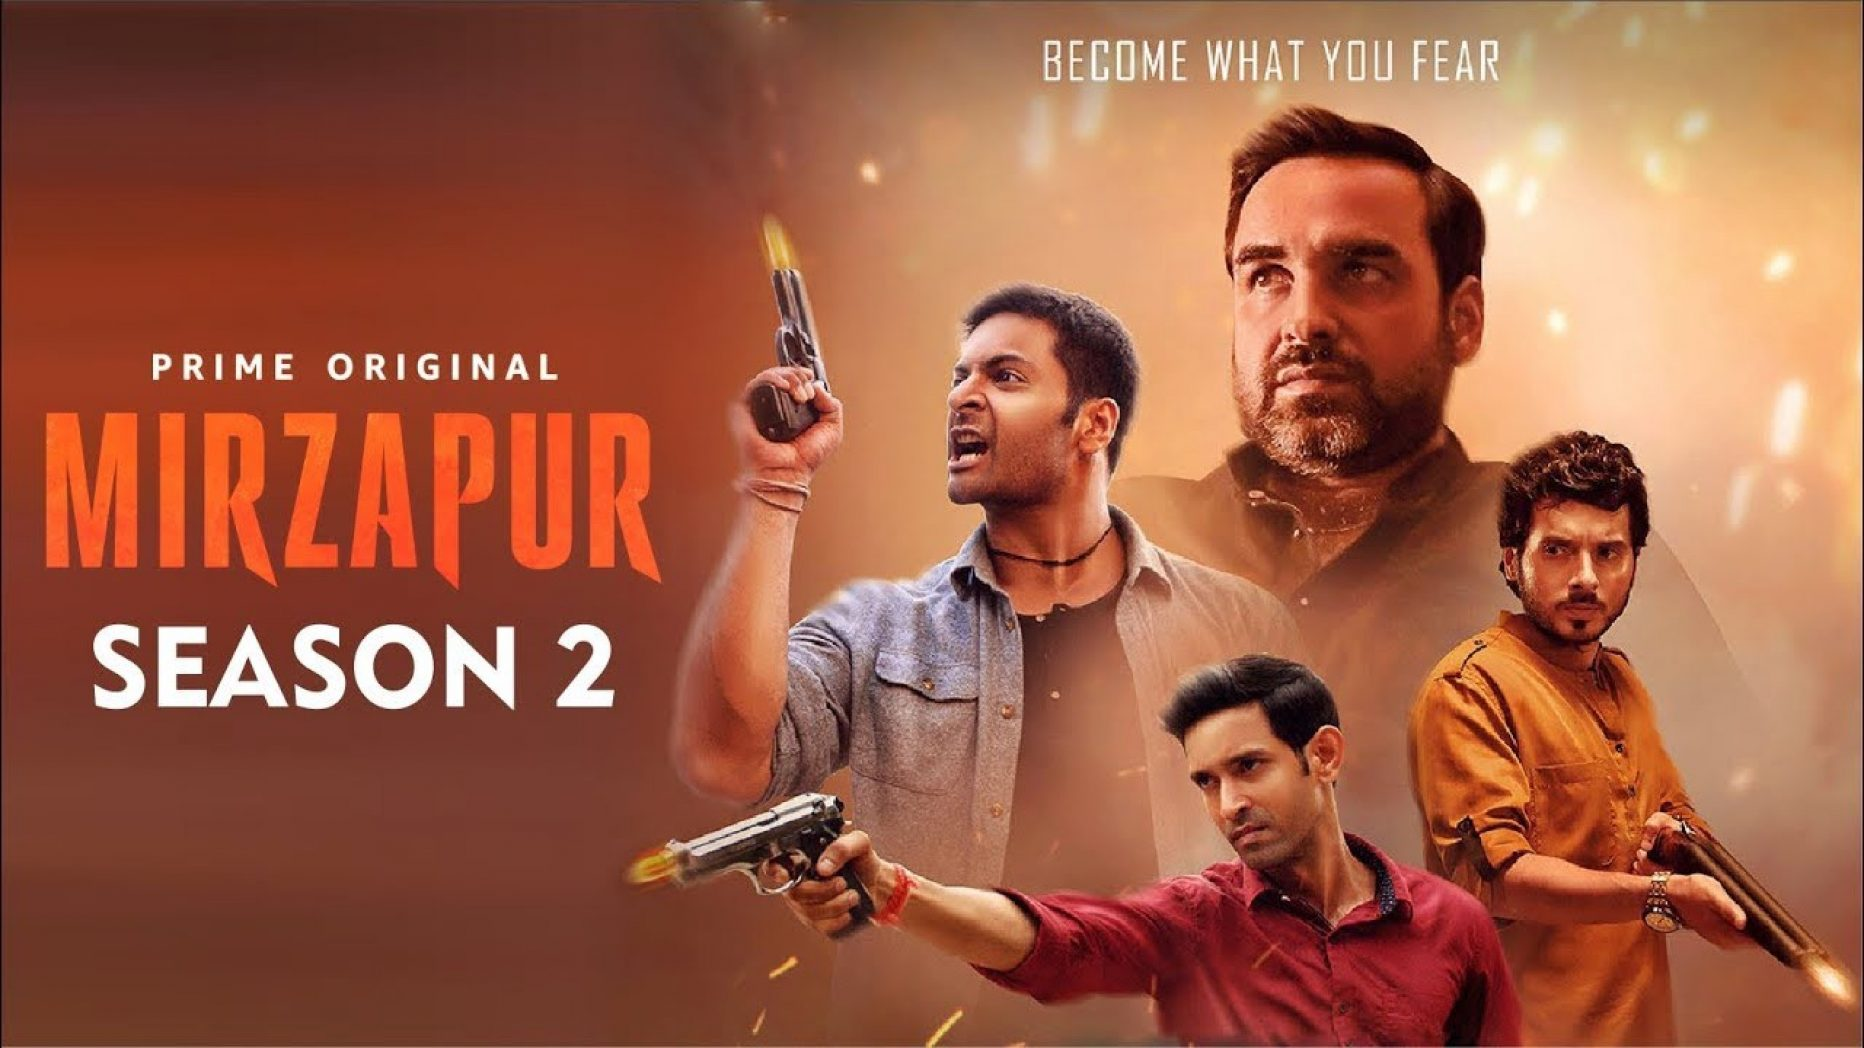 Mirzapur Season 2 Release Date in Amazon Prime, Cast, Trailer